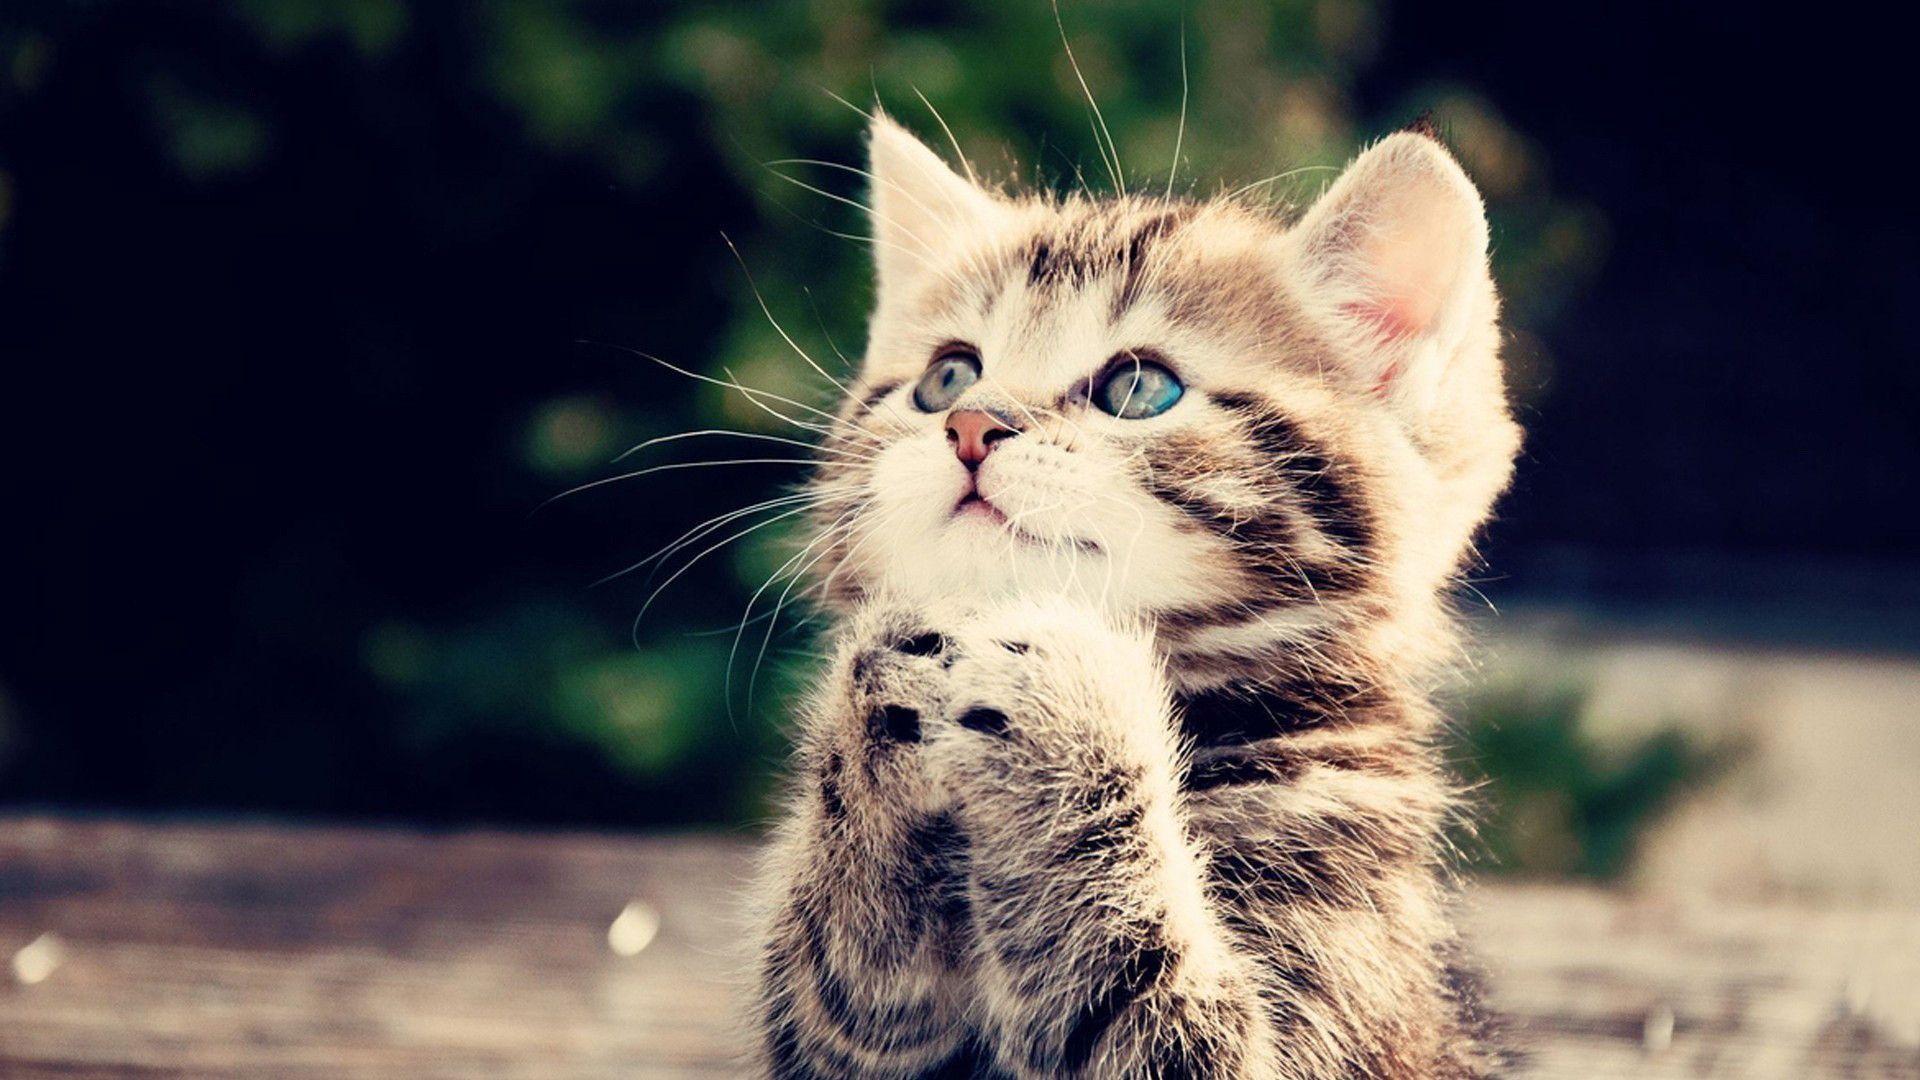 Cute Kitten Wallpaper | Wallpaper Download